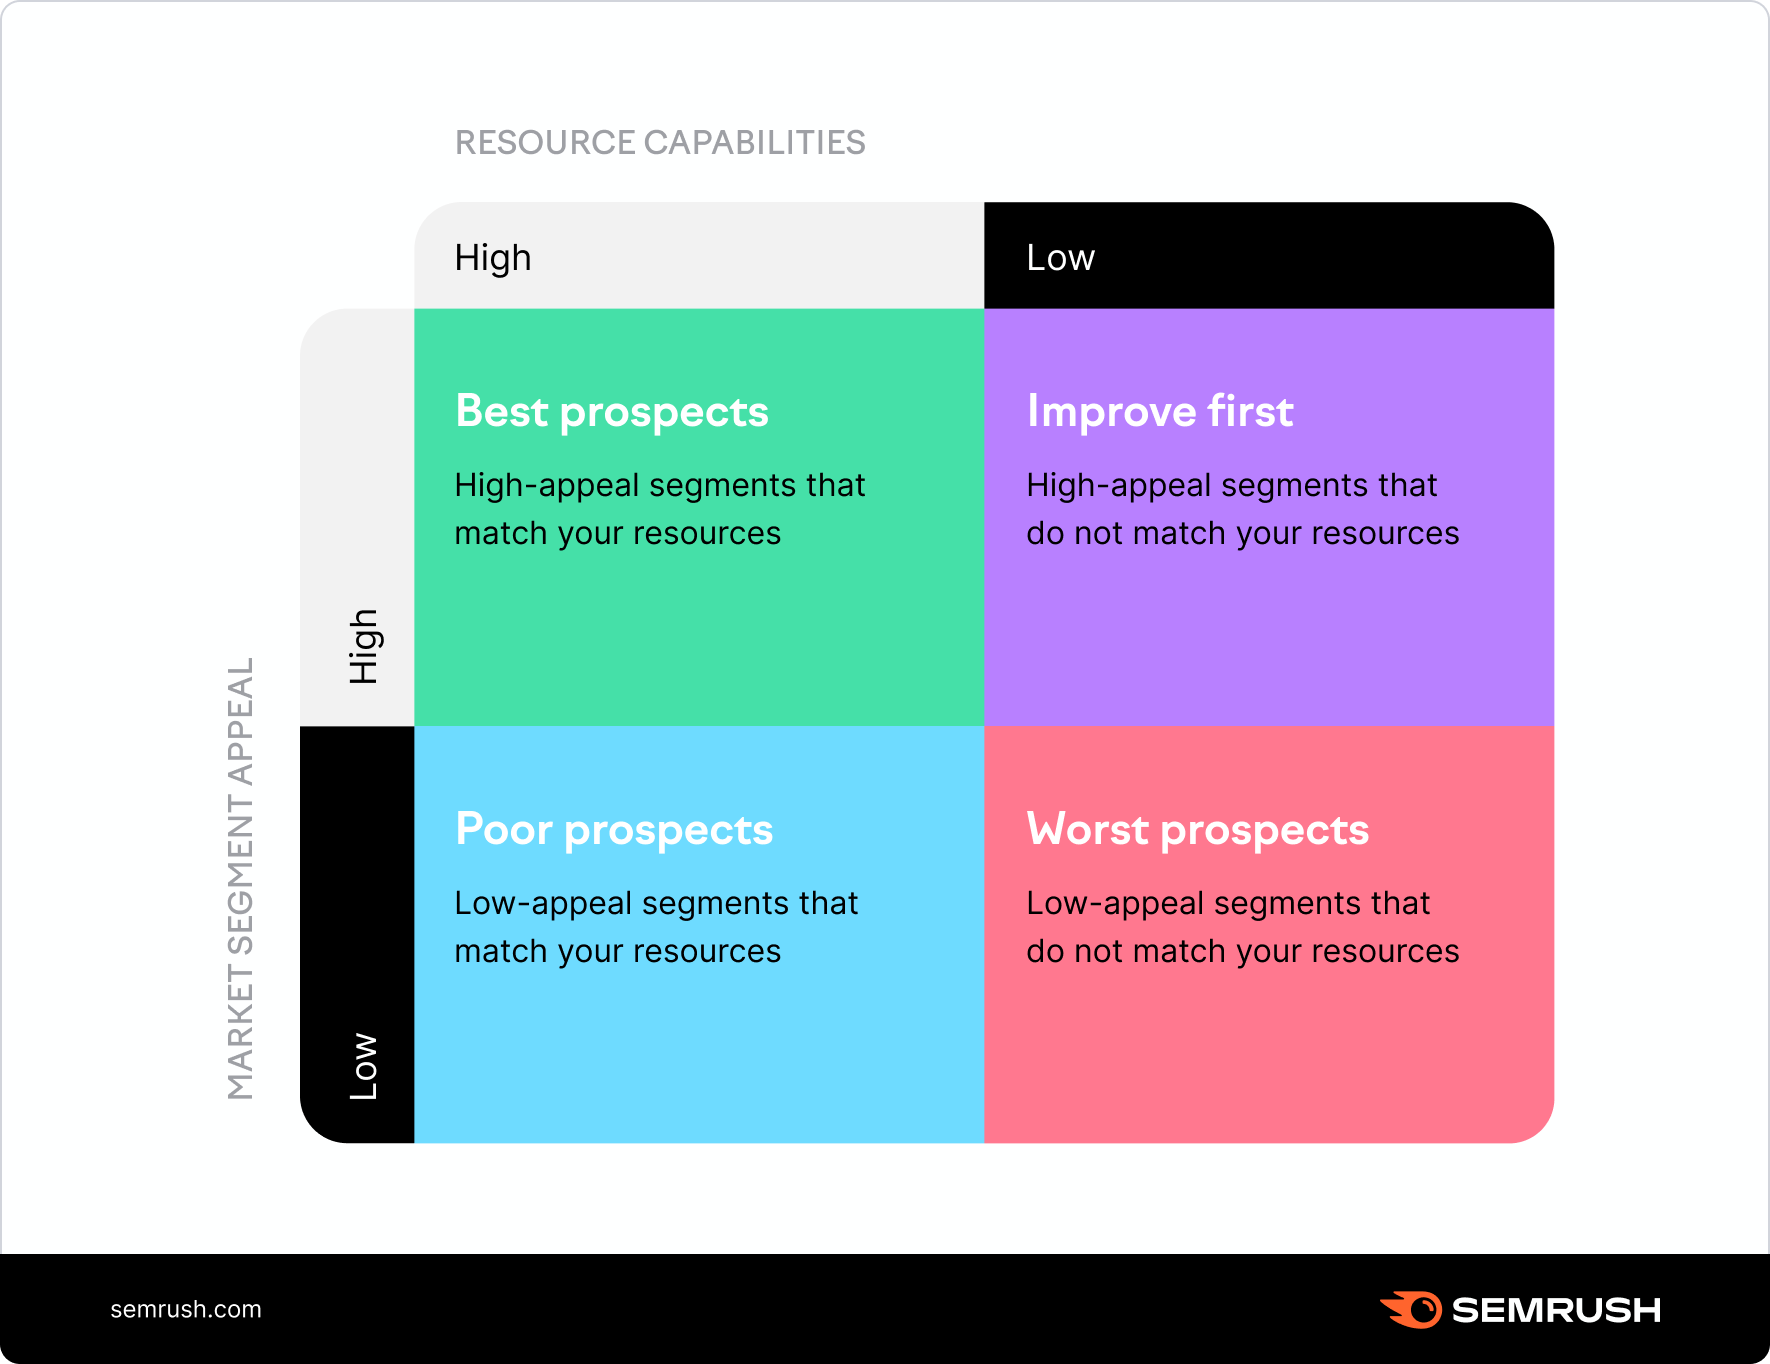 Hooley's Segment Attractiveness and Resource Strength framework